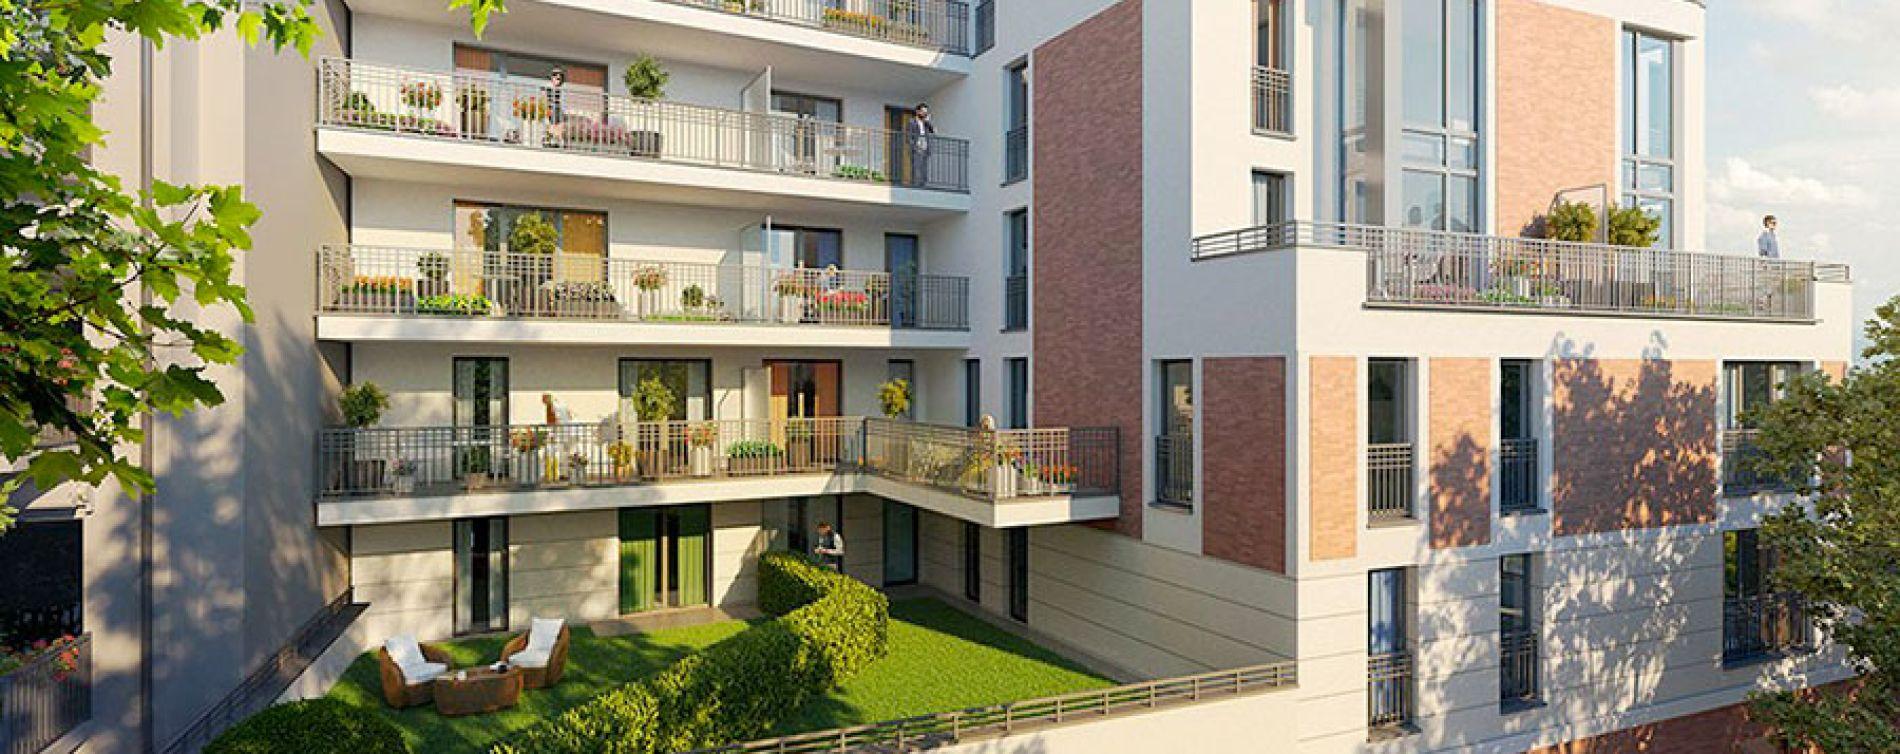 Saint-Maurice : programme immobilier neuve « Panoramiq' » (3)